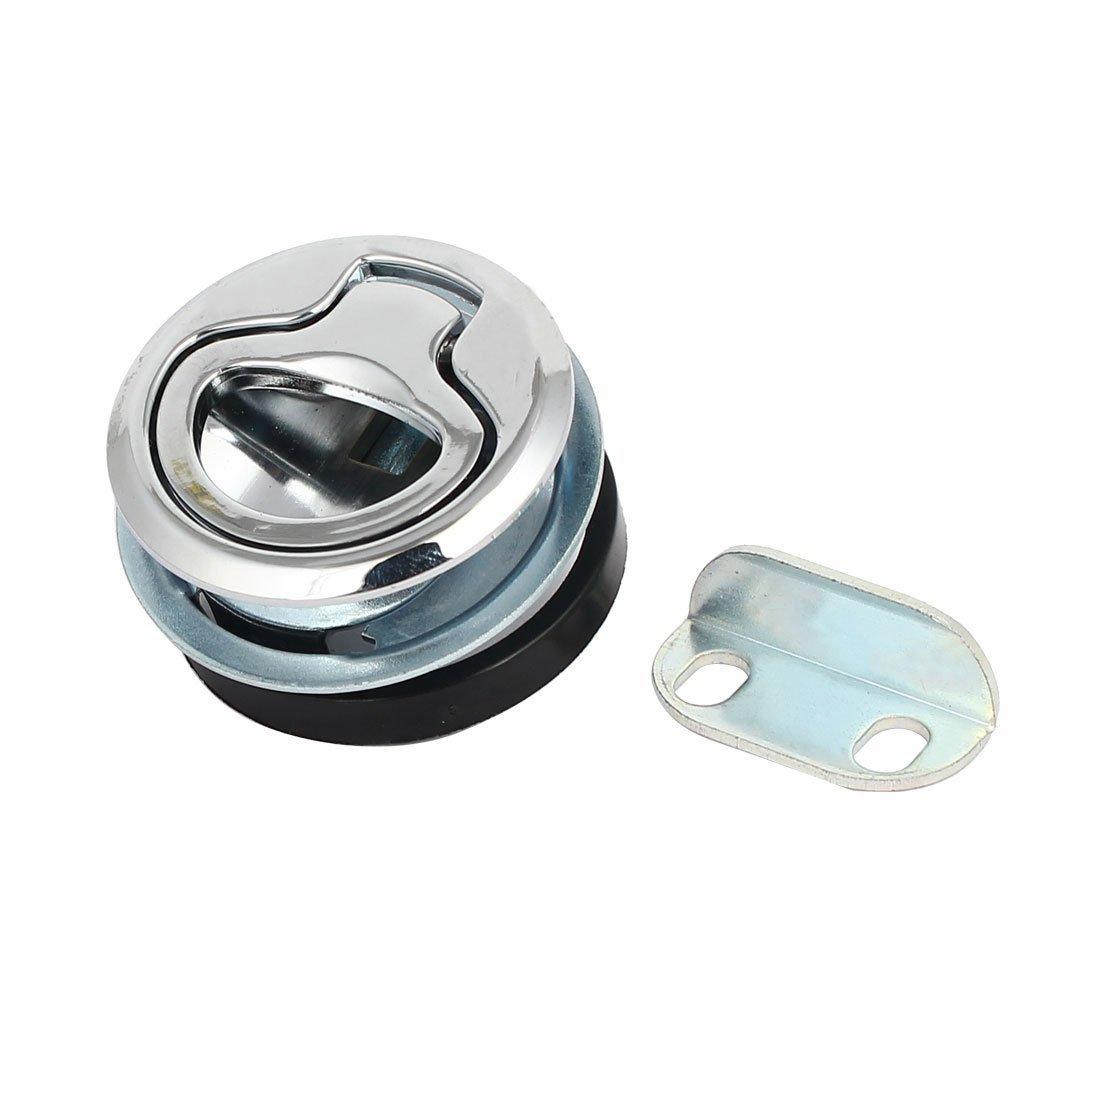 Uxcell a16121700ux1189 Uxcell a16121700ux1189 Zinc Alloy Round Shape Flush Pull Keyless Slam Latch Lock Locker Silver Tone, Zinc